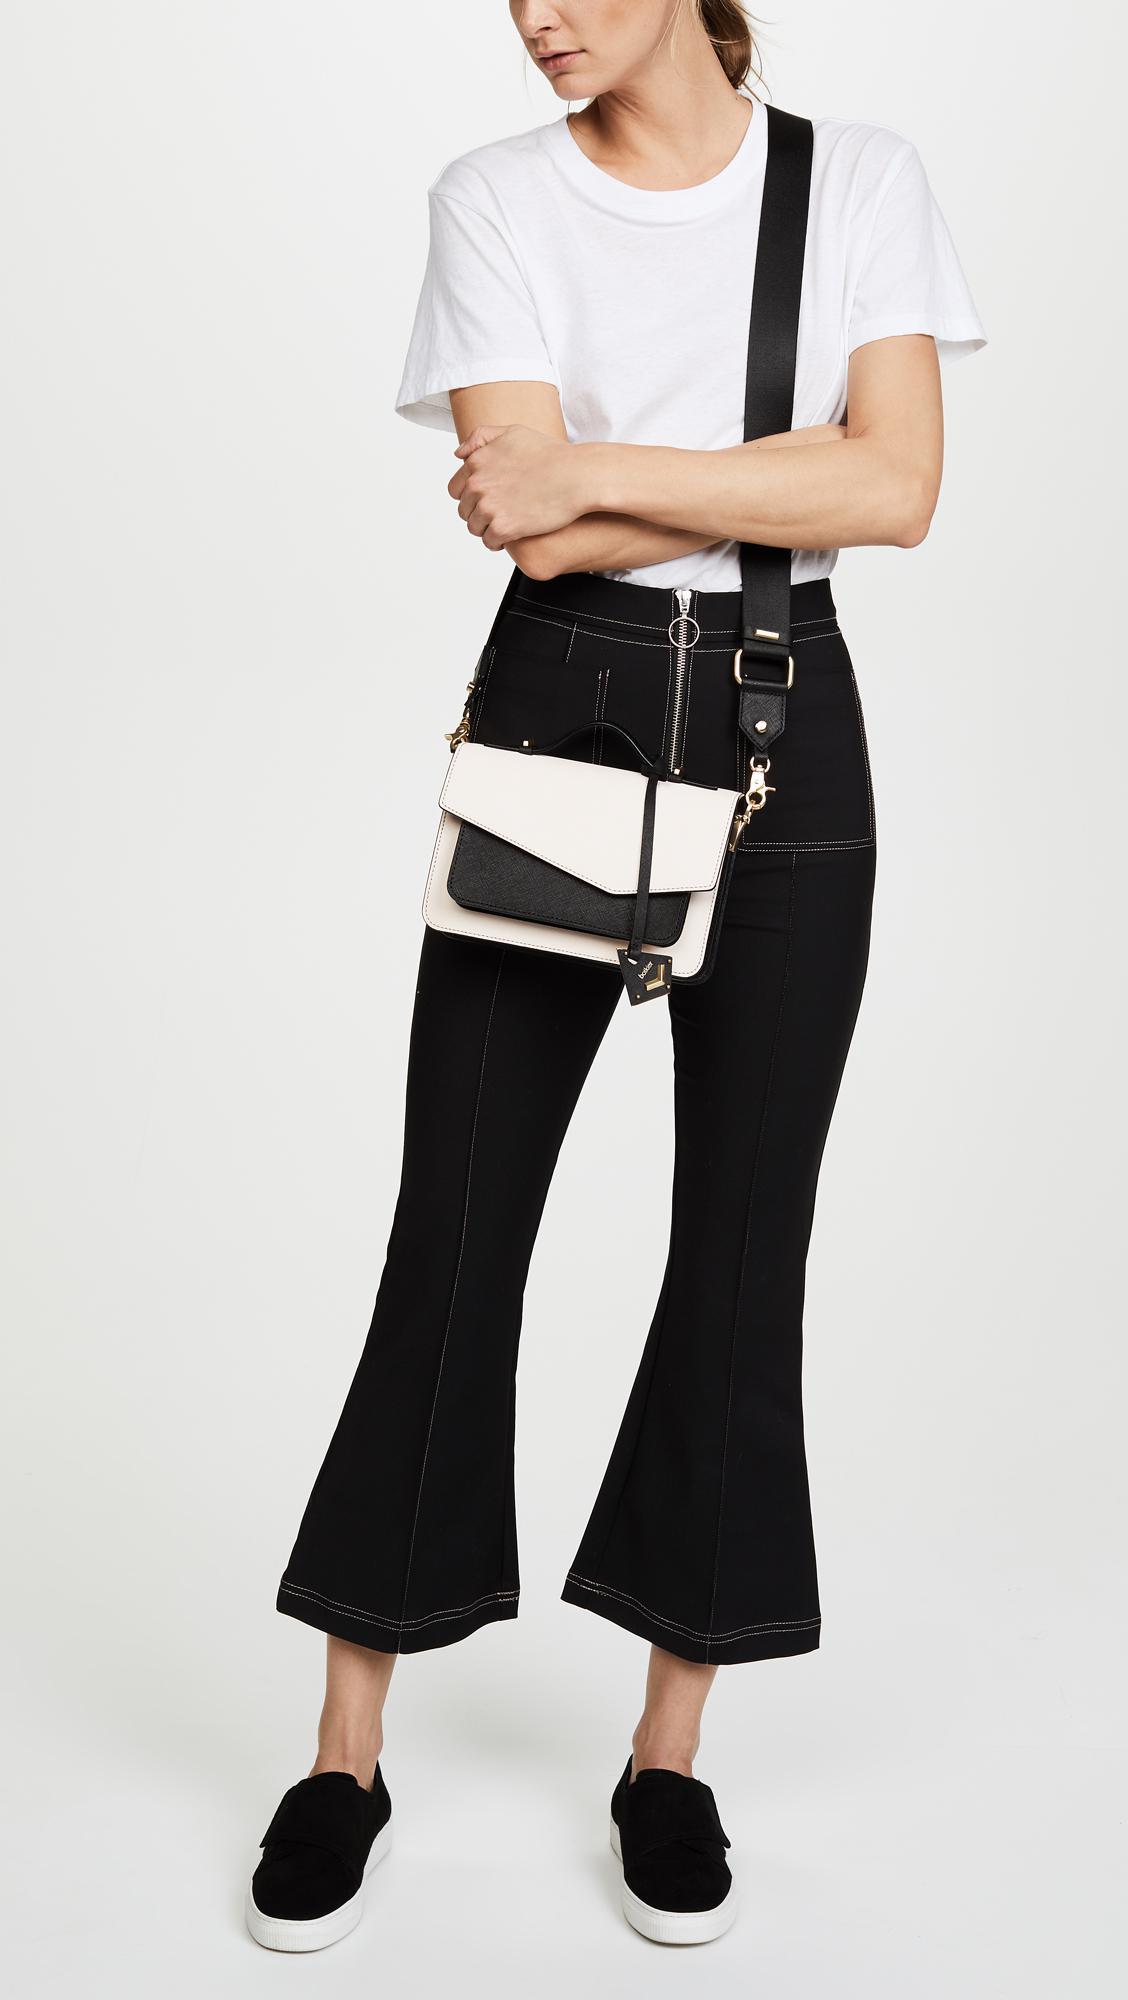 Botkier Leather Cobble Hill Cross Body Bag in Blossom/Black (Black)